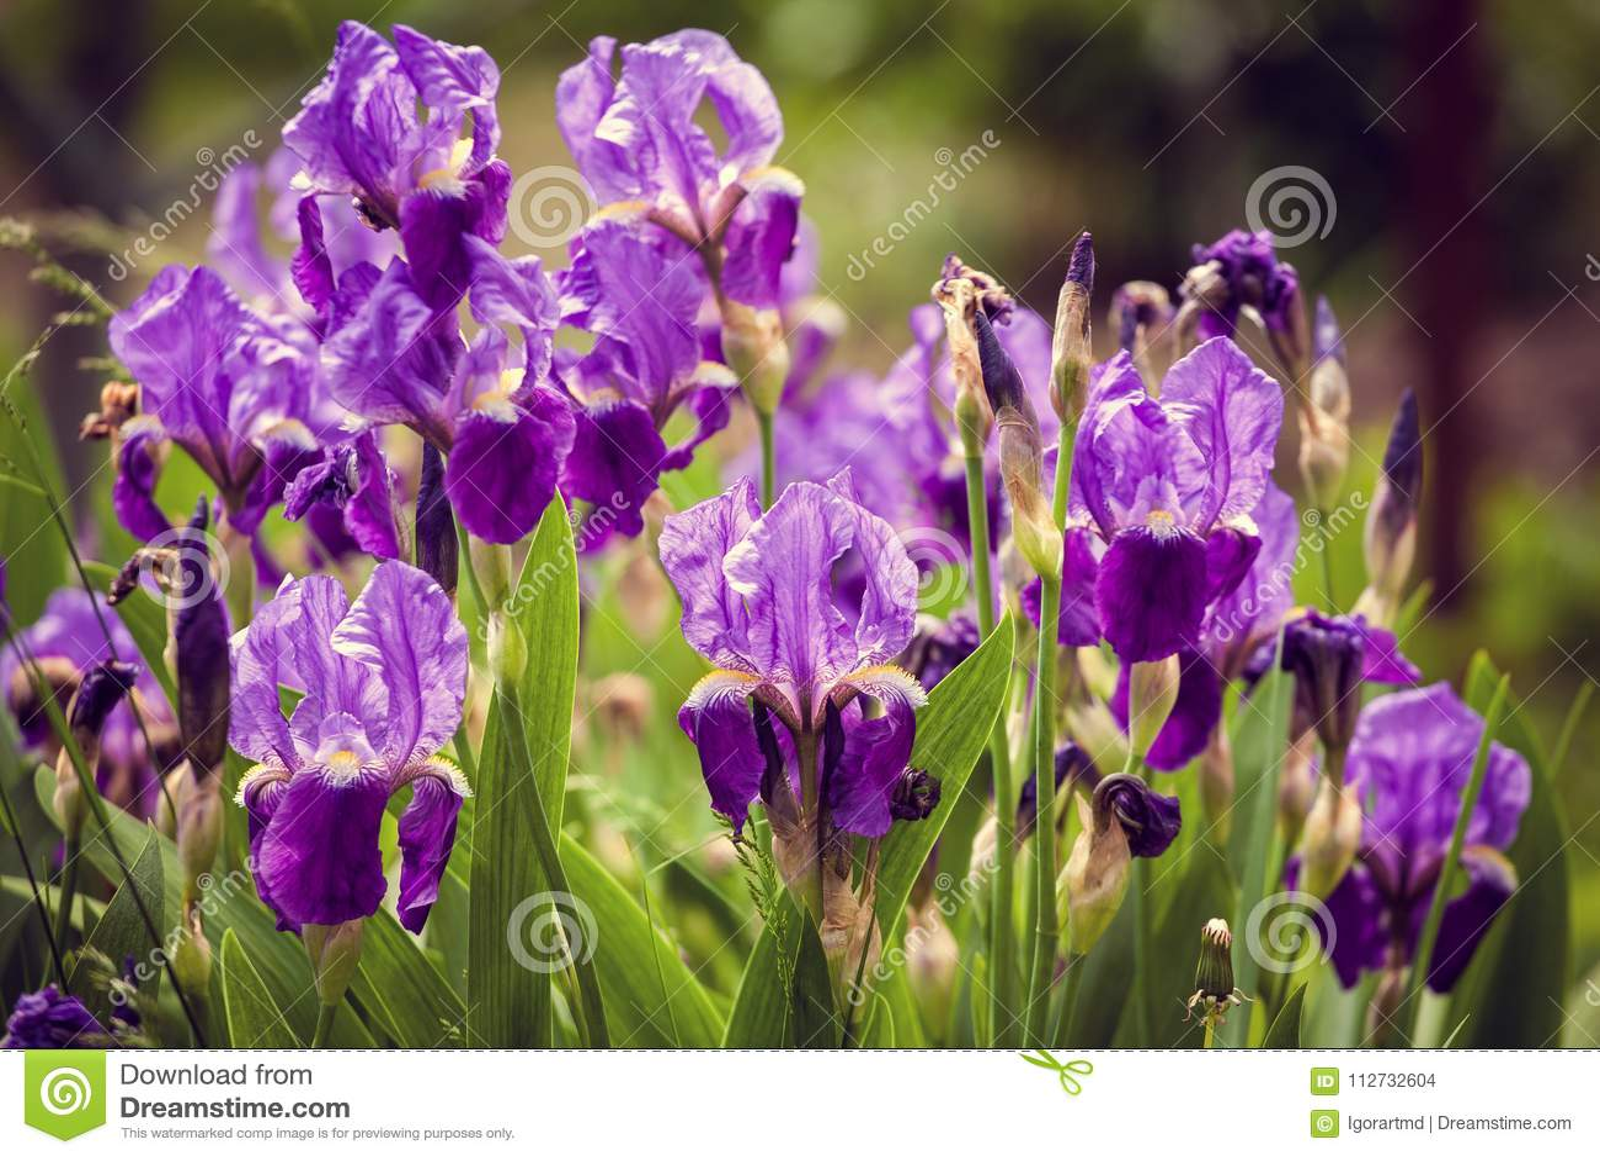 Iris Flower In Garden Stock Photo Image Of Beautiful 112732604